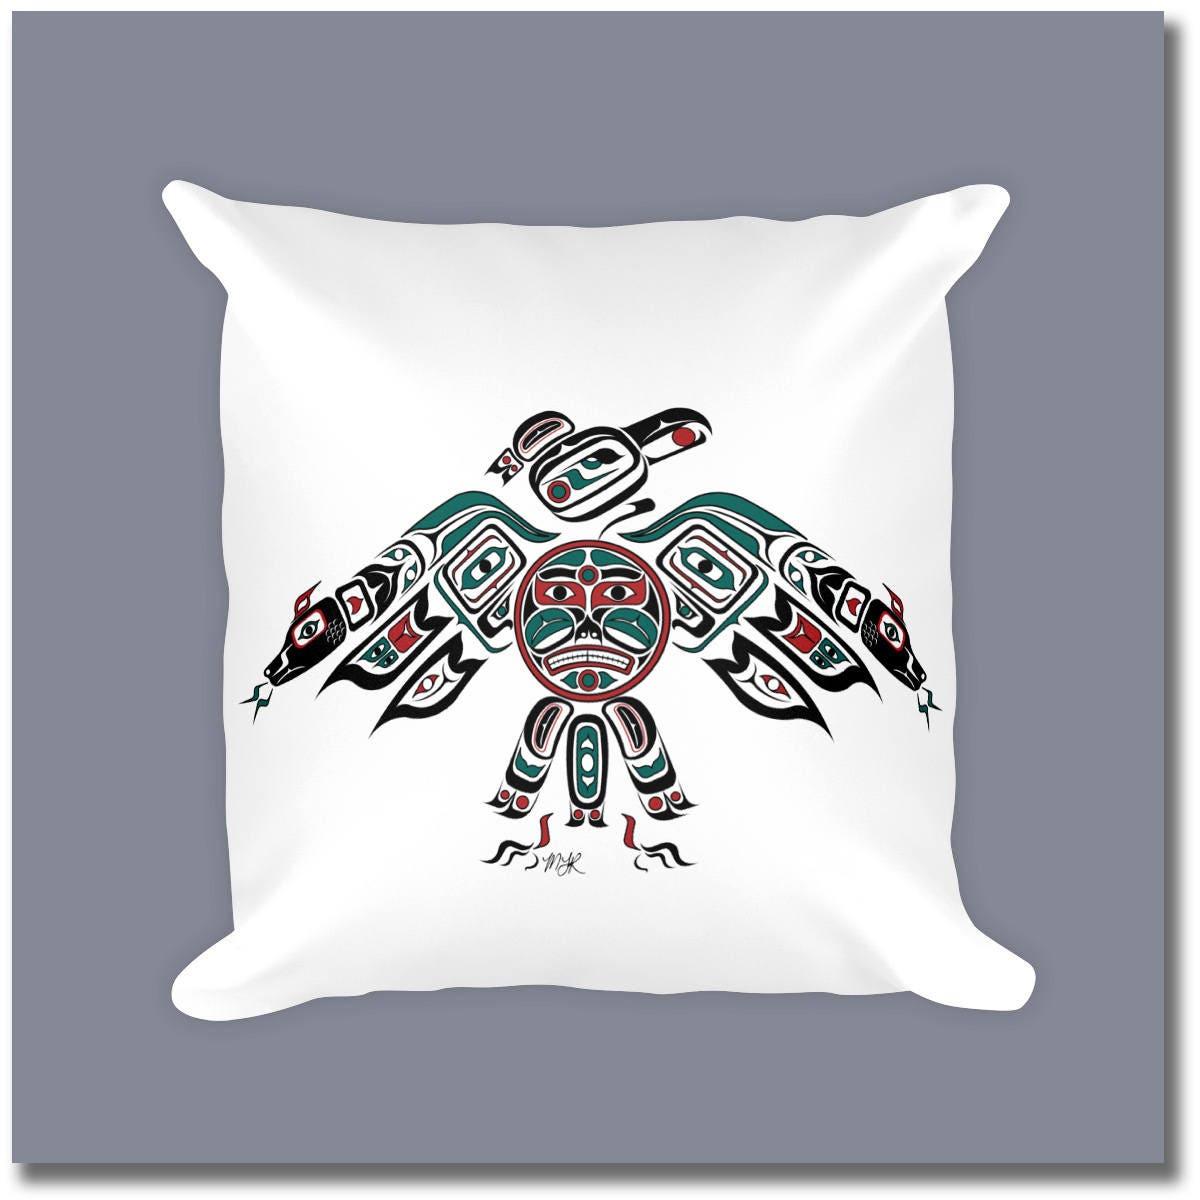 Canadian Inspired Home Decor Canada Pillow Via Etsy: Haida Art Style Throw Pillow Thunderbird